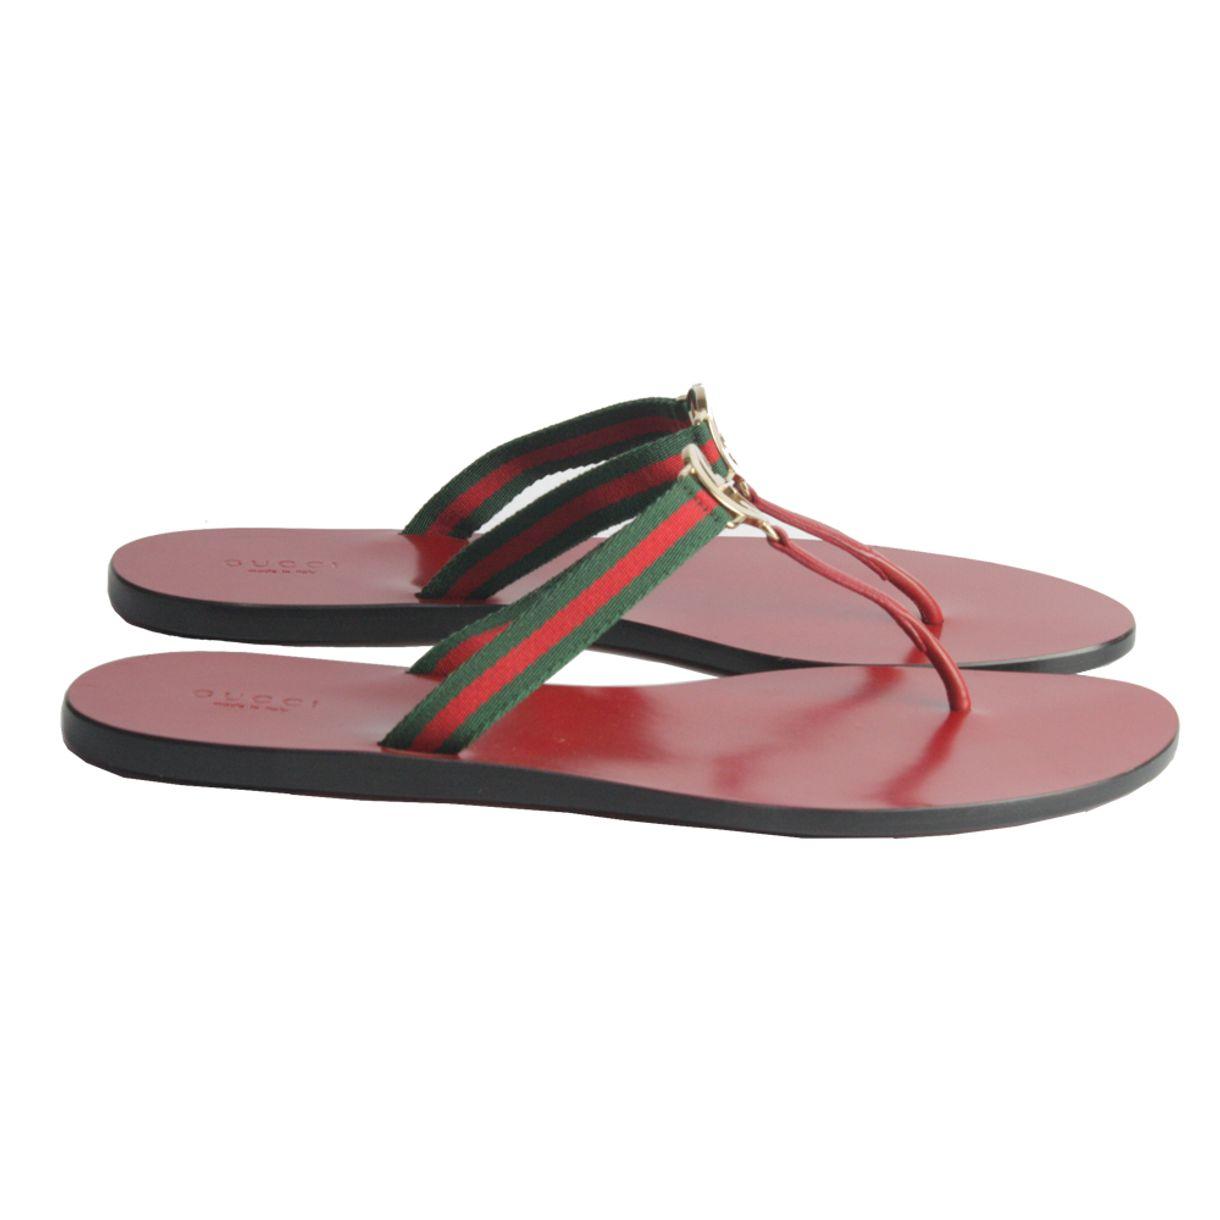 Sandalia-Flat-Gucci-Sola-Vermelha